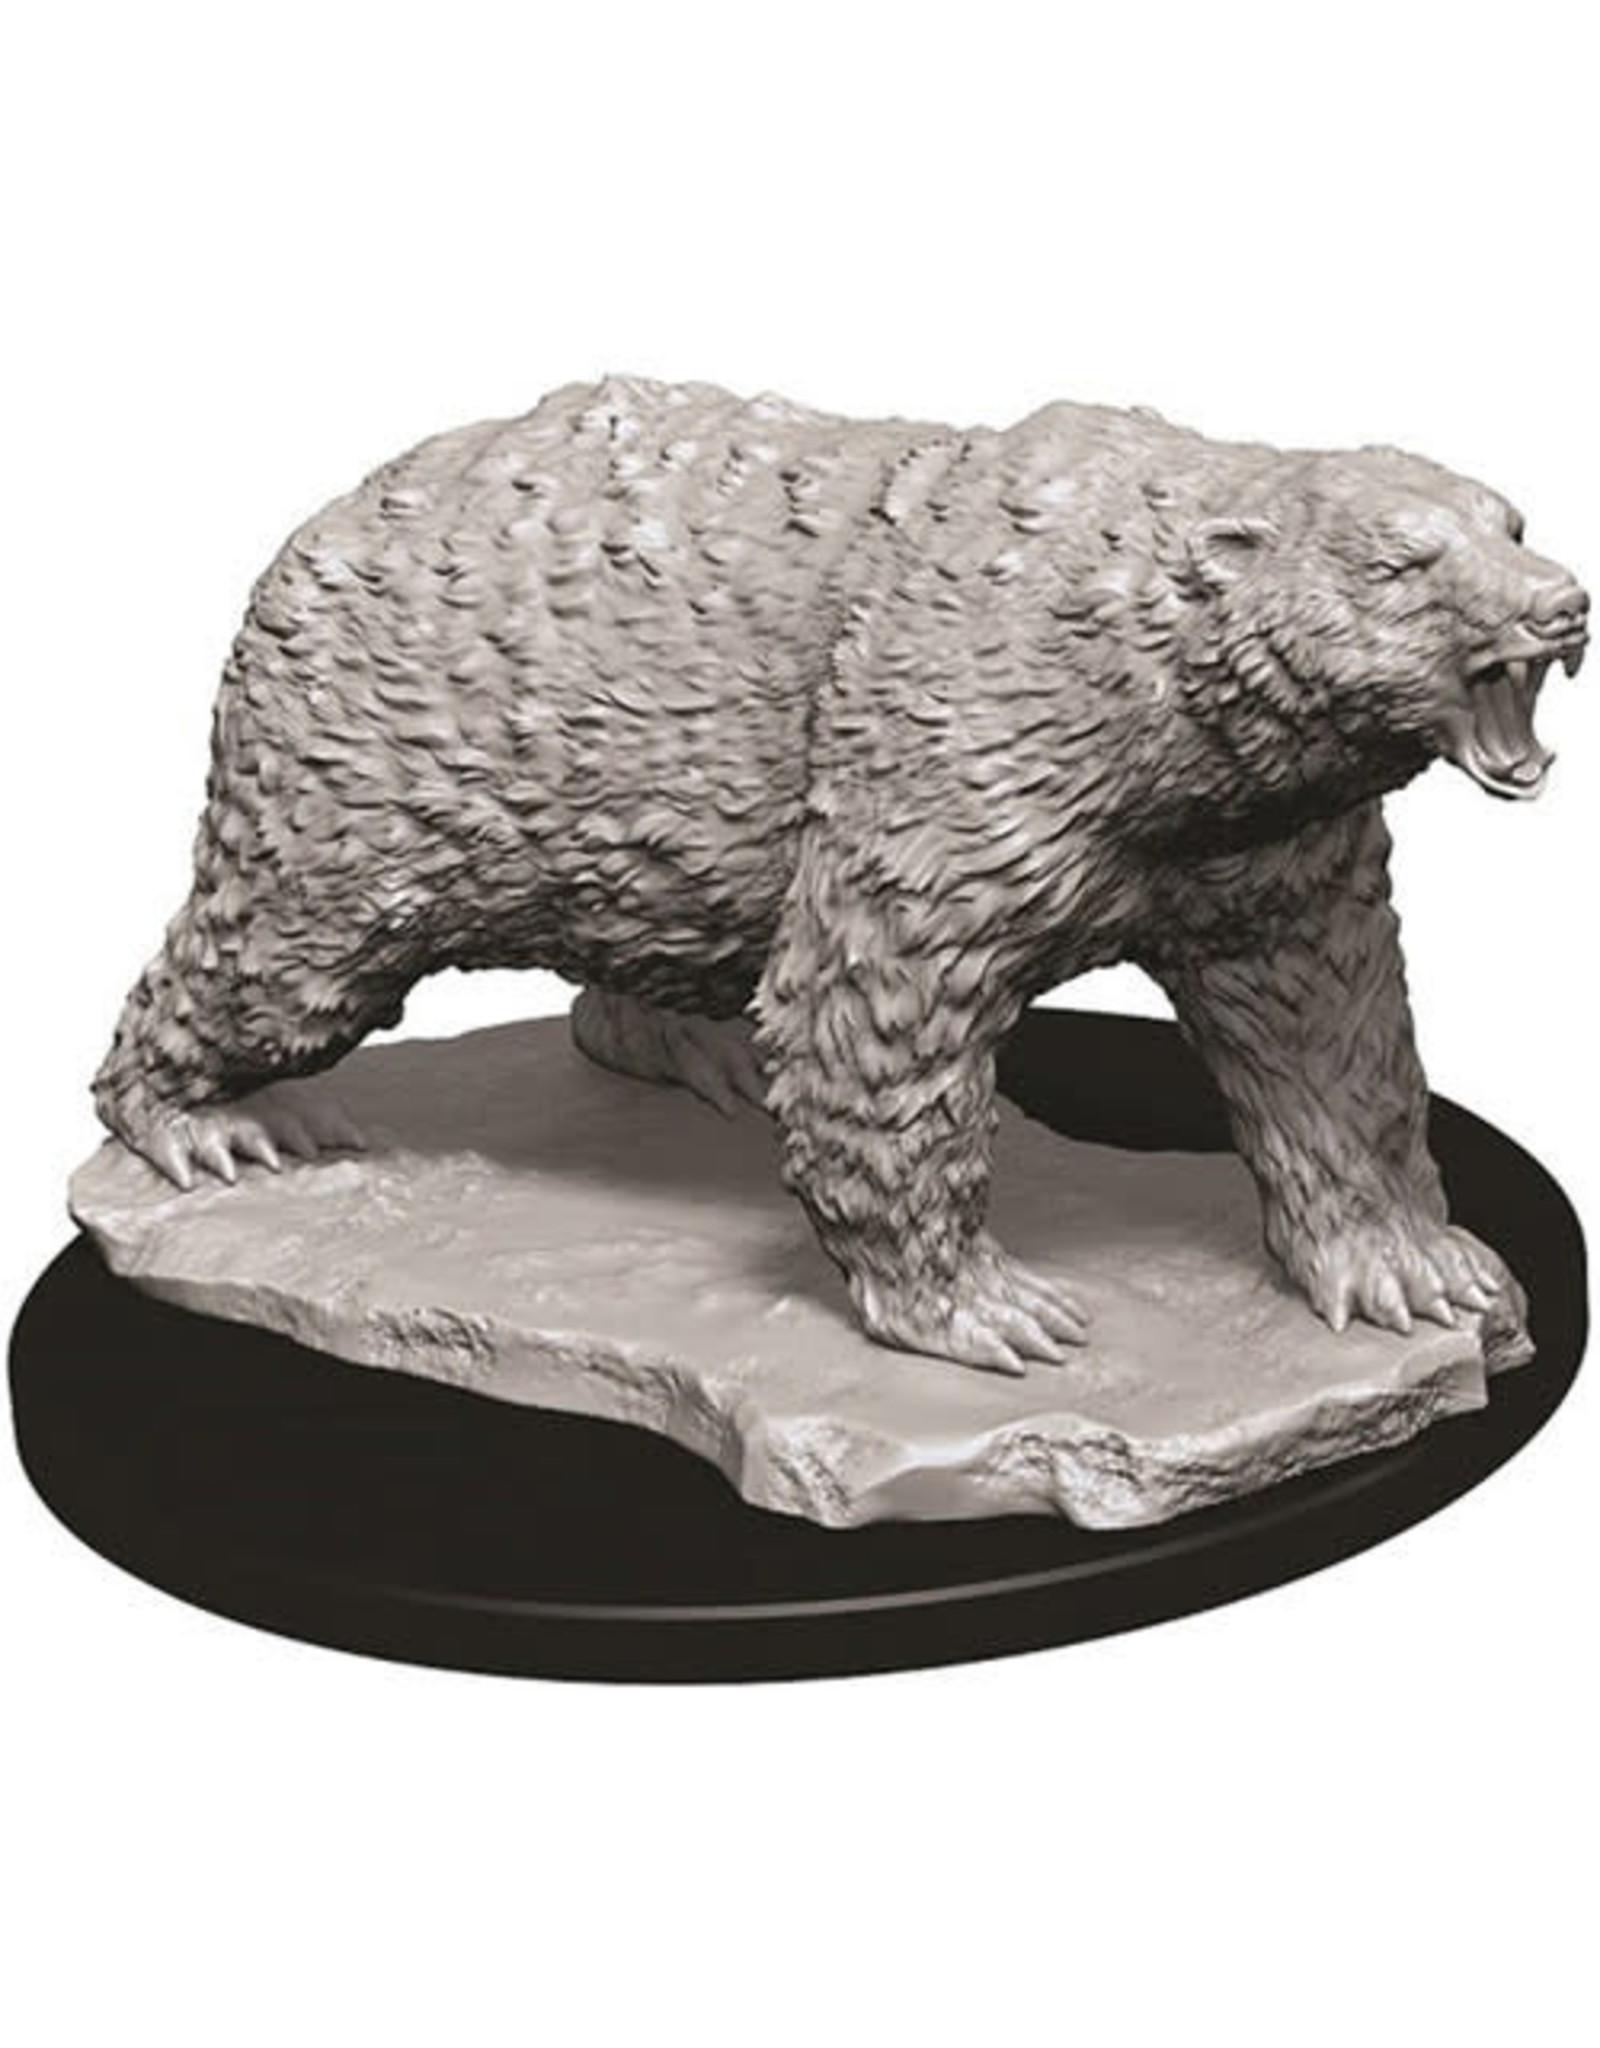 D&D Unpainted Minis: Polar Bear (Wave 9)